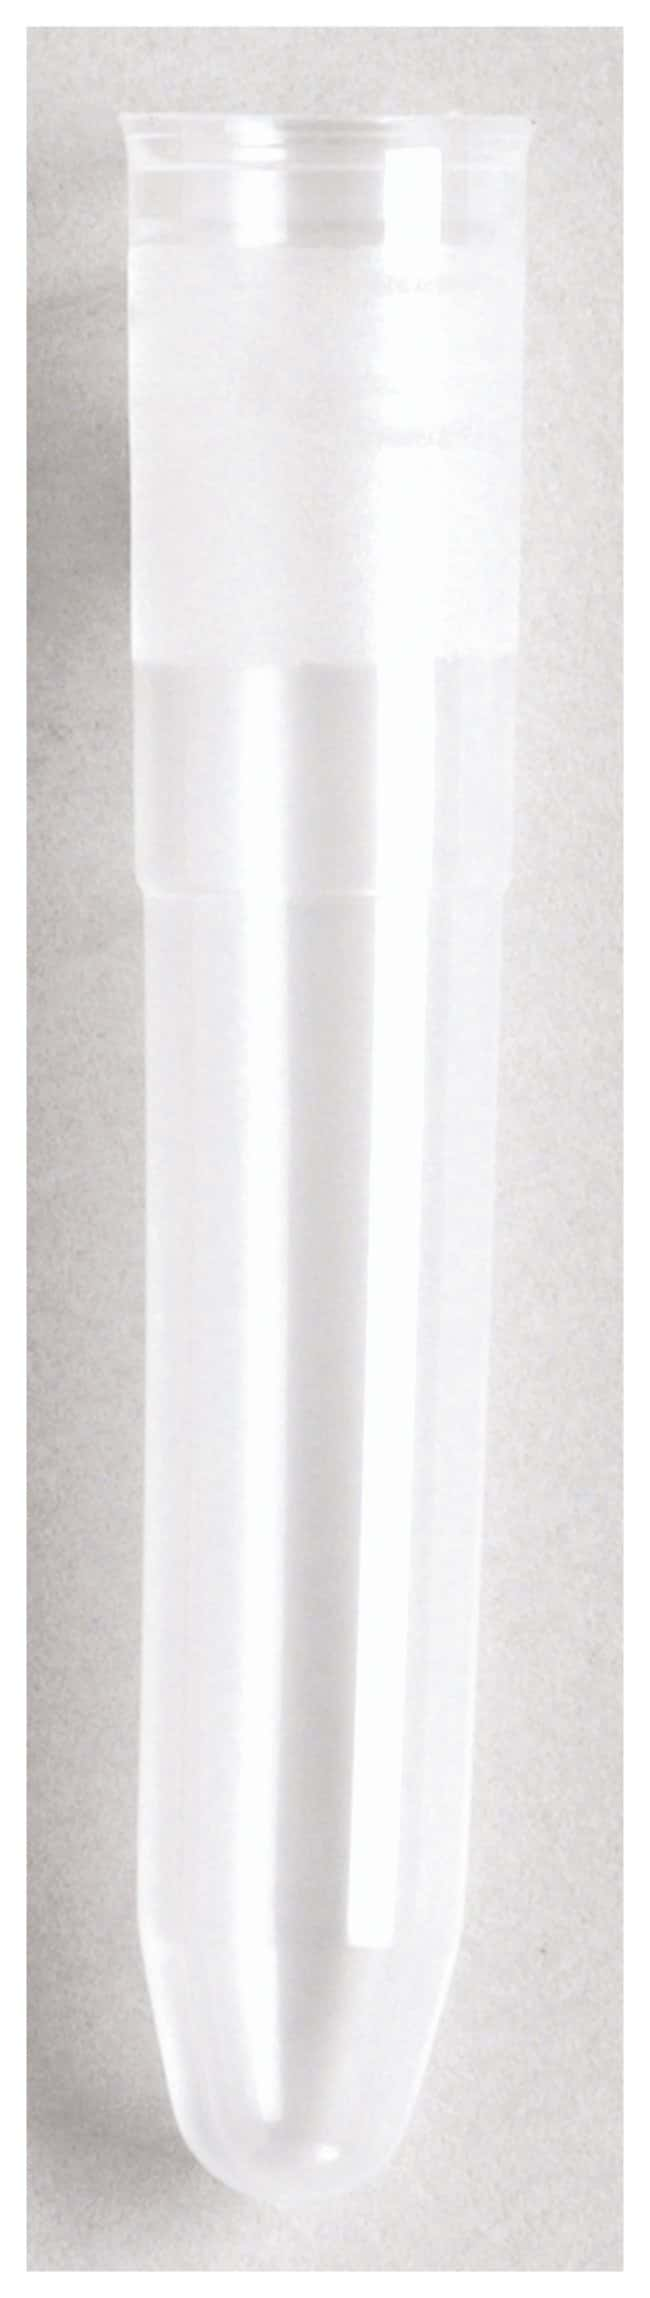 Fisherbrand Polypropylene Microtiter Tubes, Plain tubes; Nonsterile; Bagged:Test